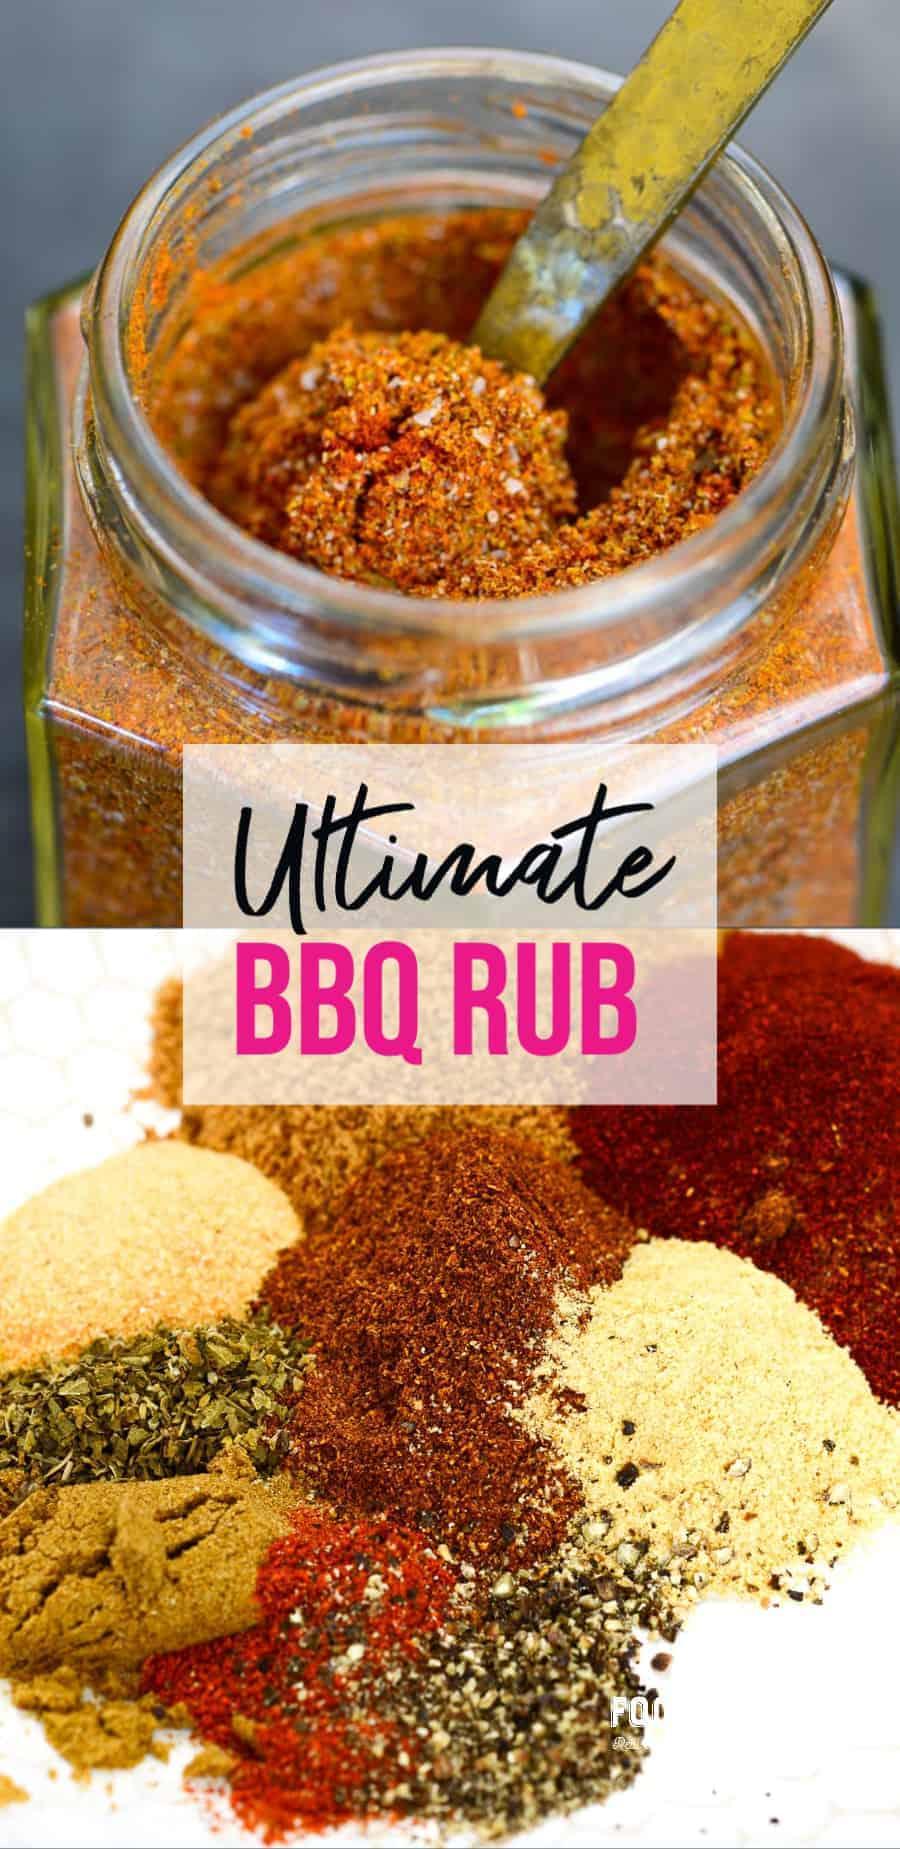 ultimate bbq rub recipe. pinterest image | foodology geek